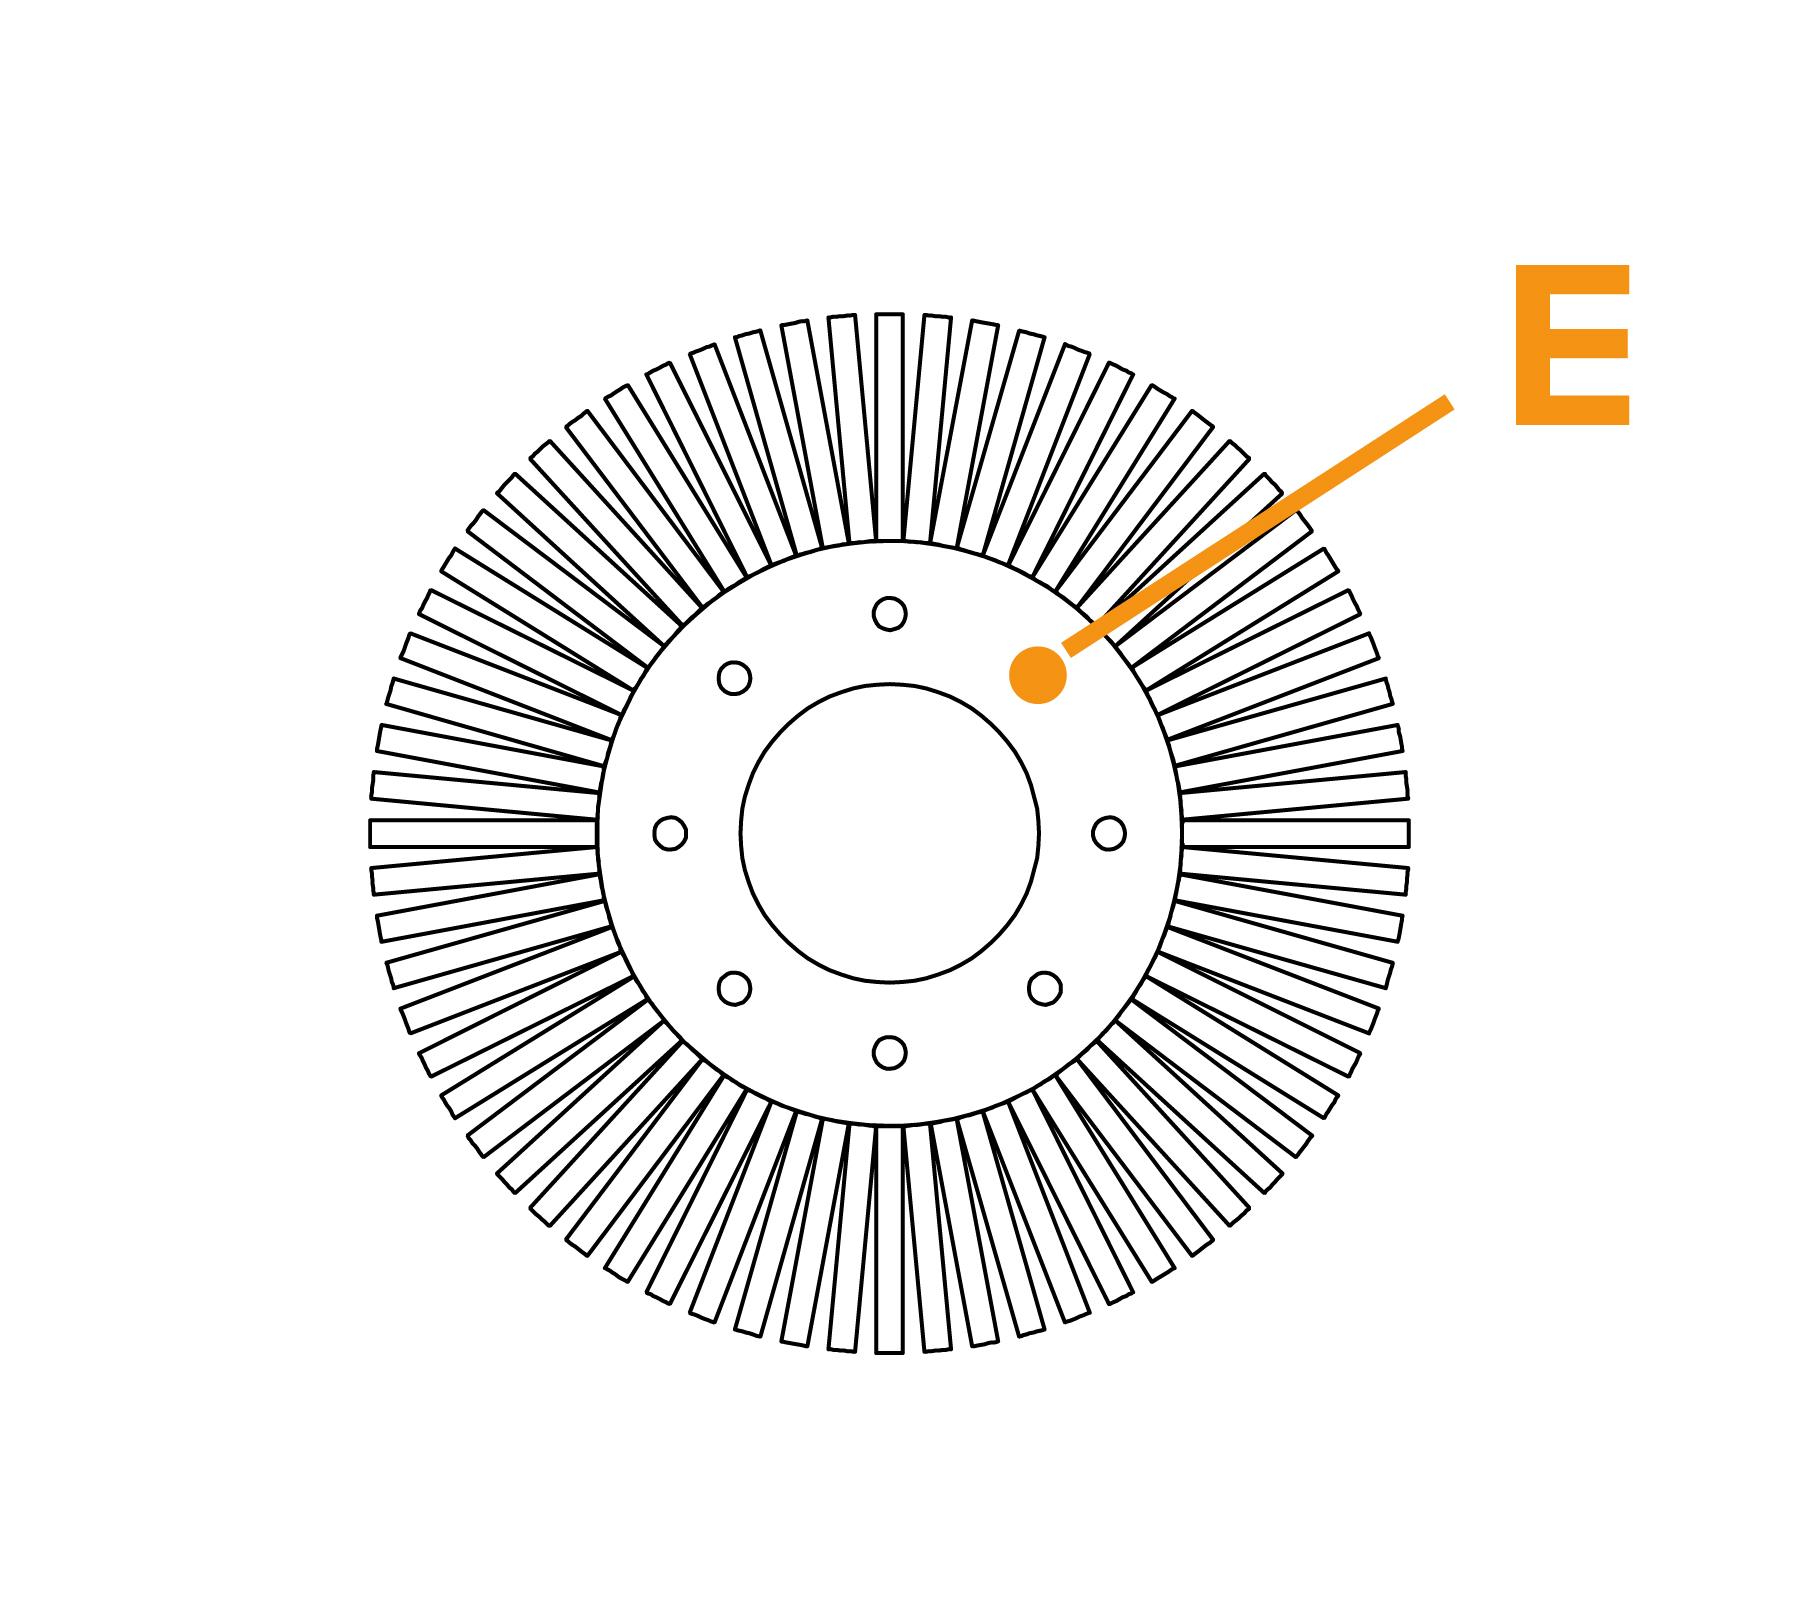 Potloodborstel met vaste kern - diagram E